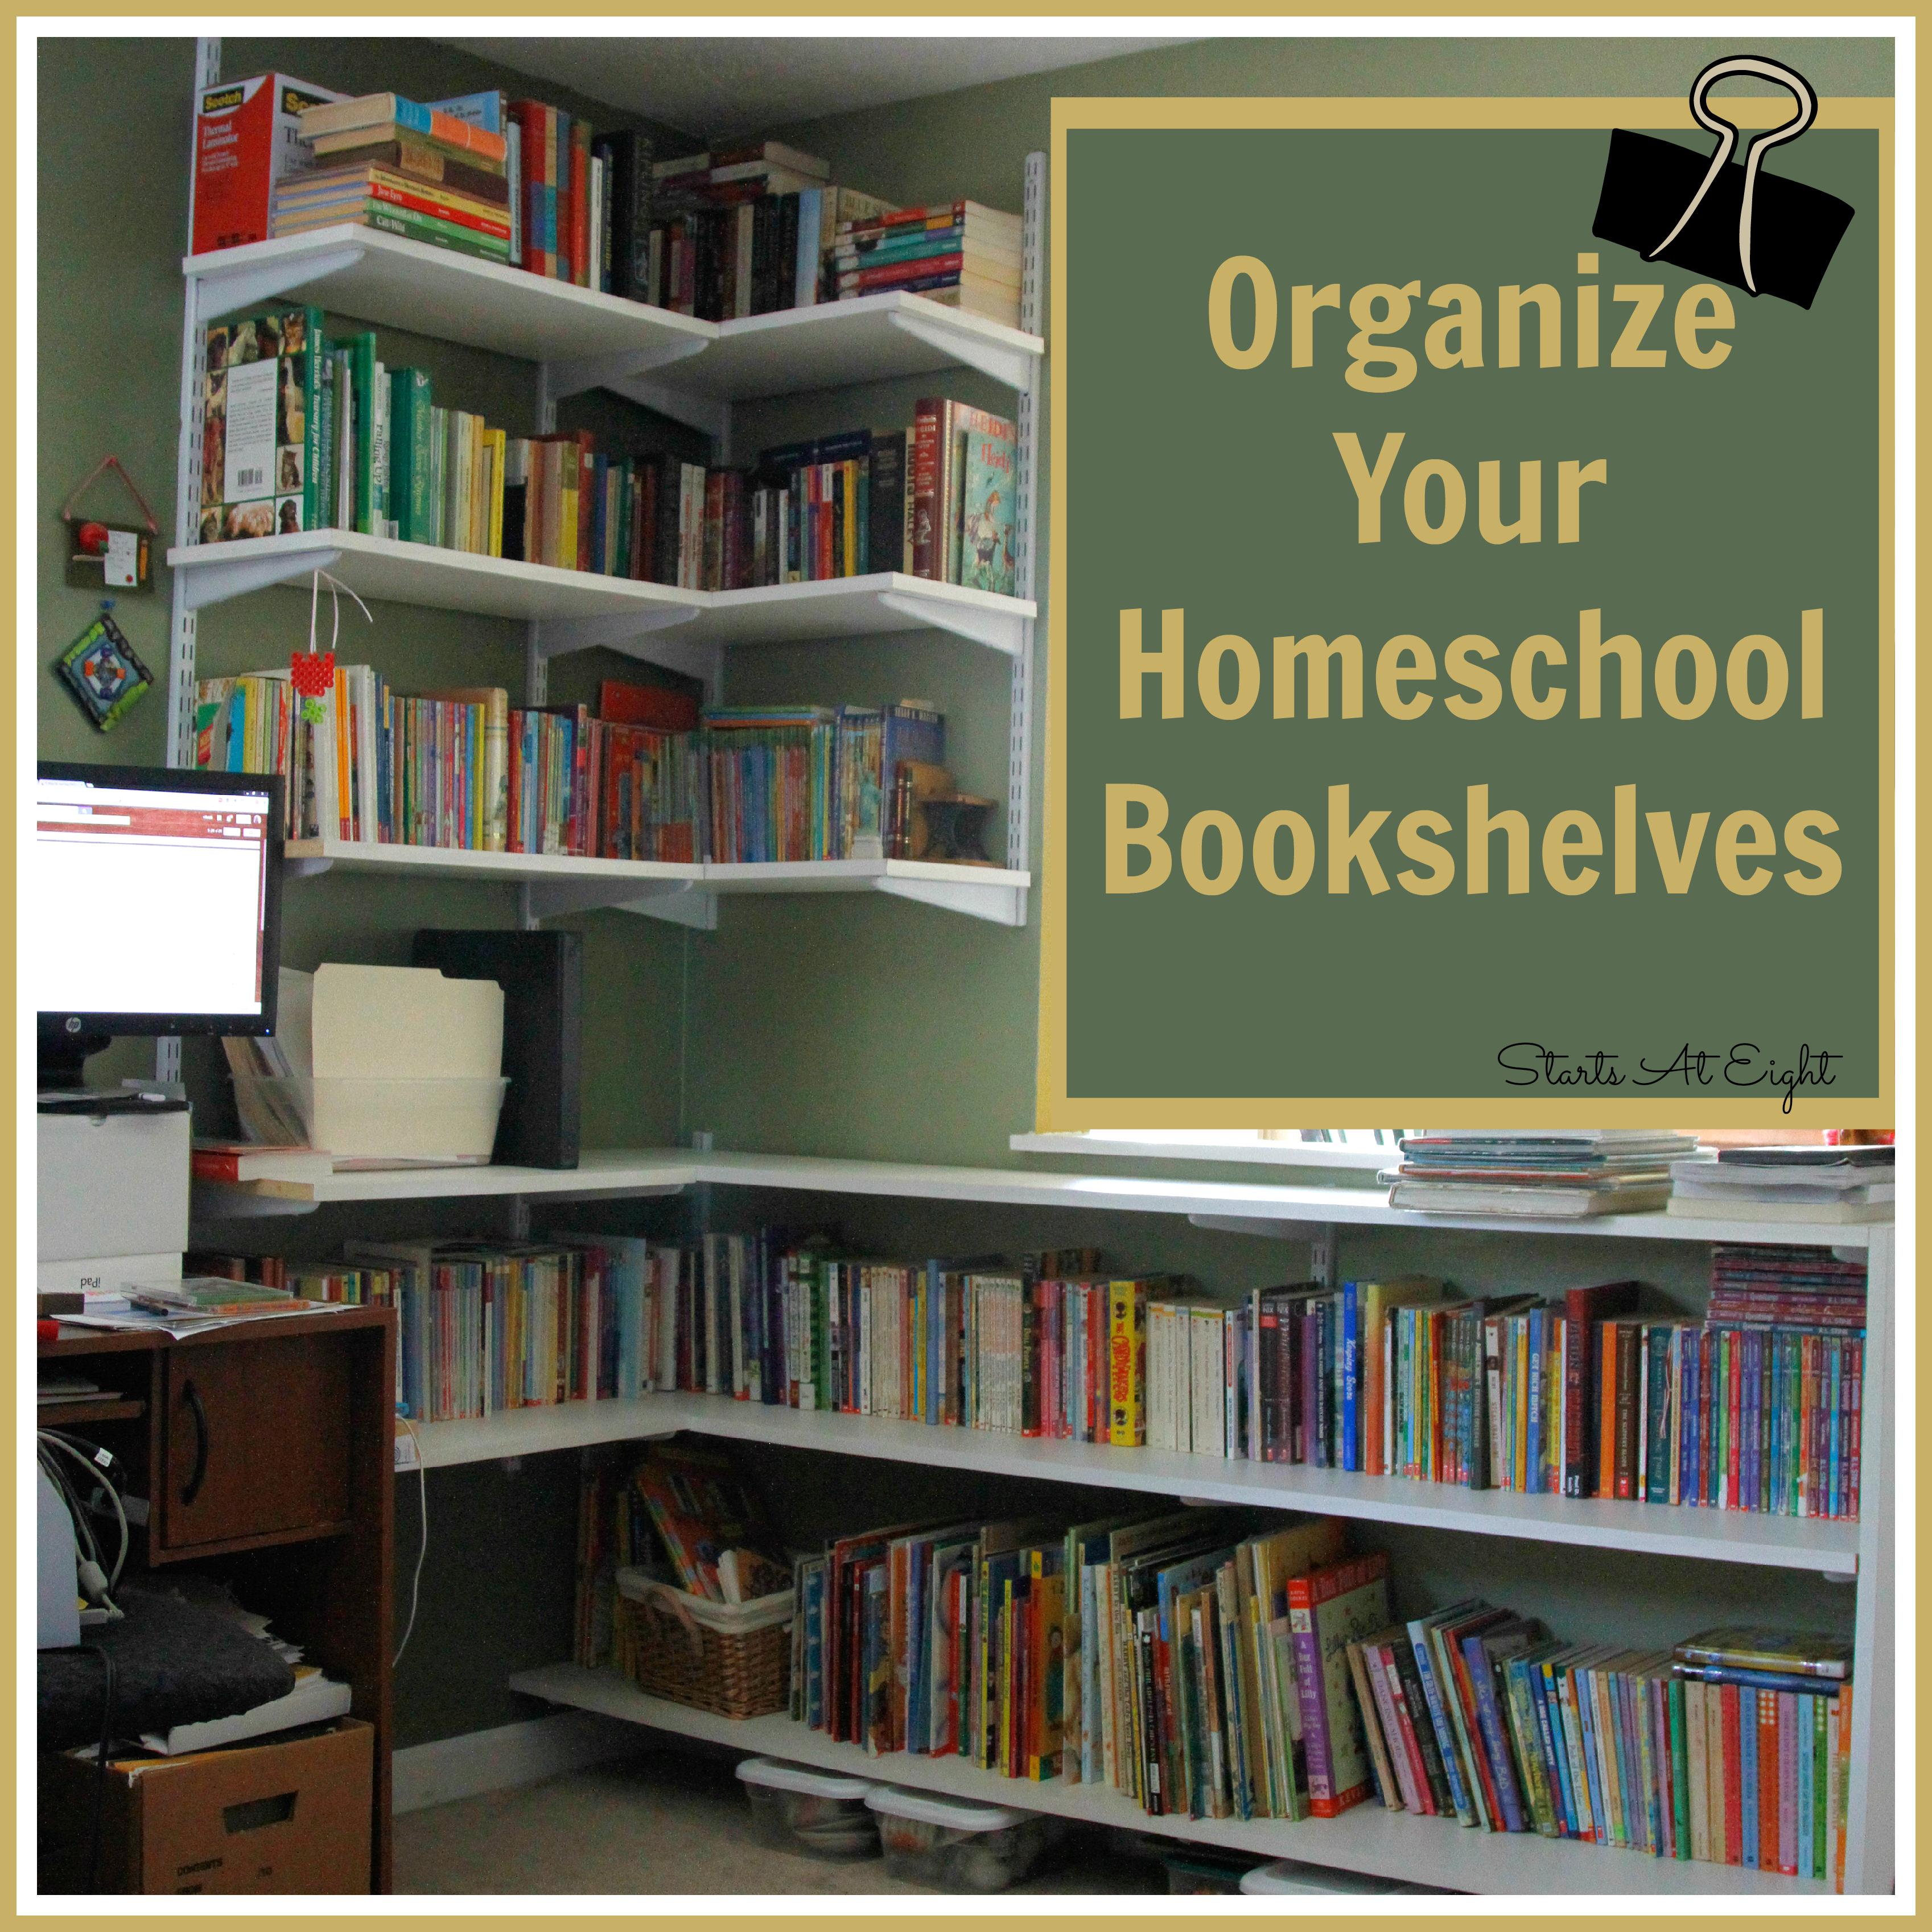 Organize Your Homeschool Bookshelves Startsateight